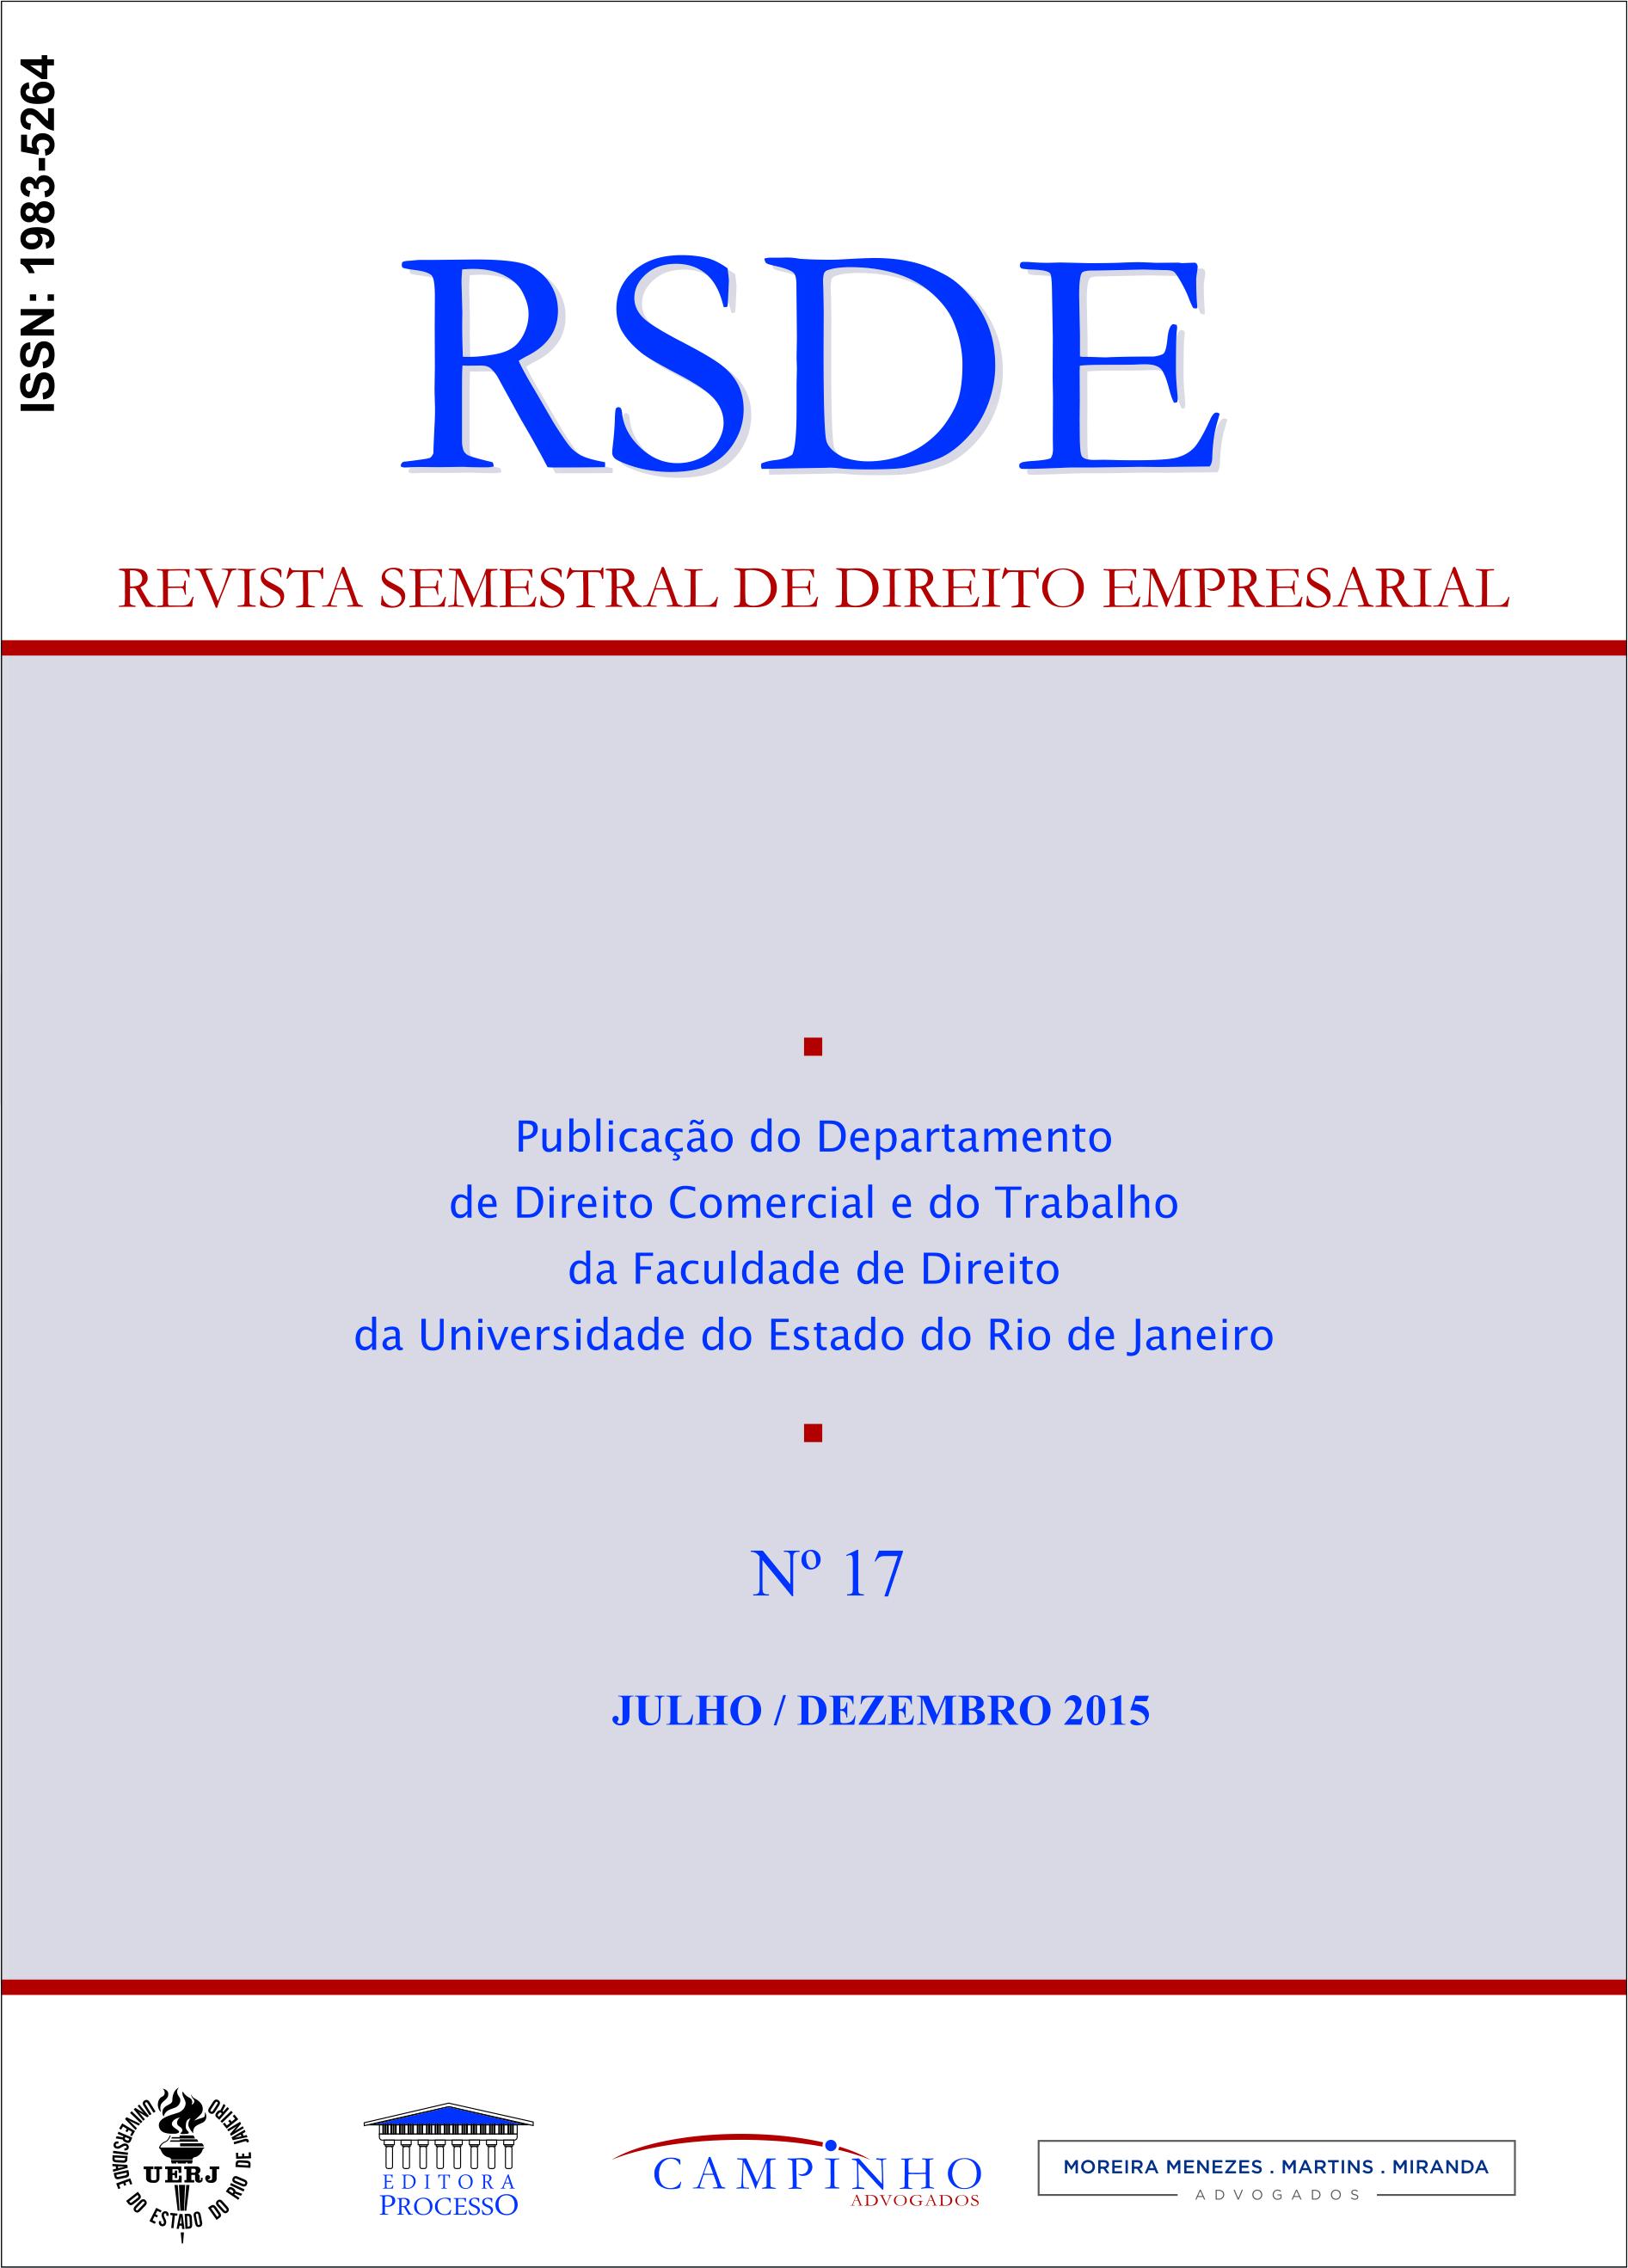 Rsde_17